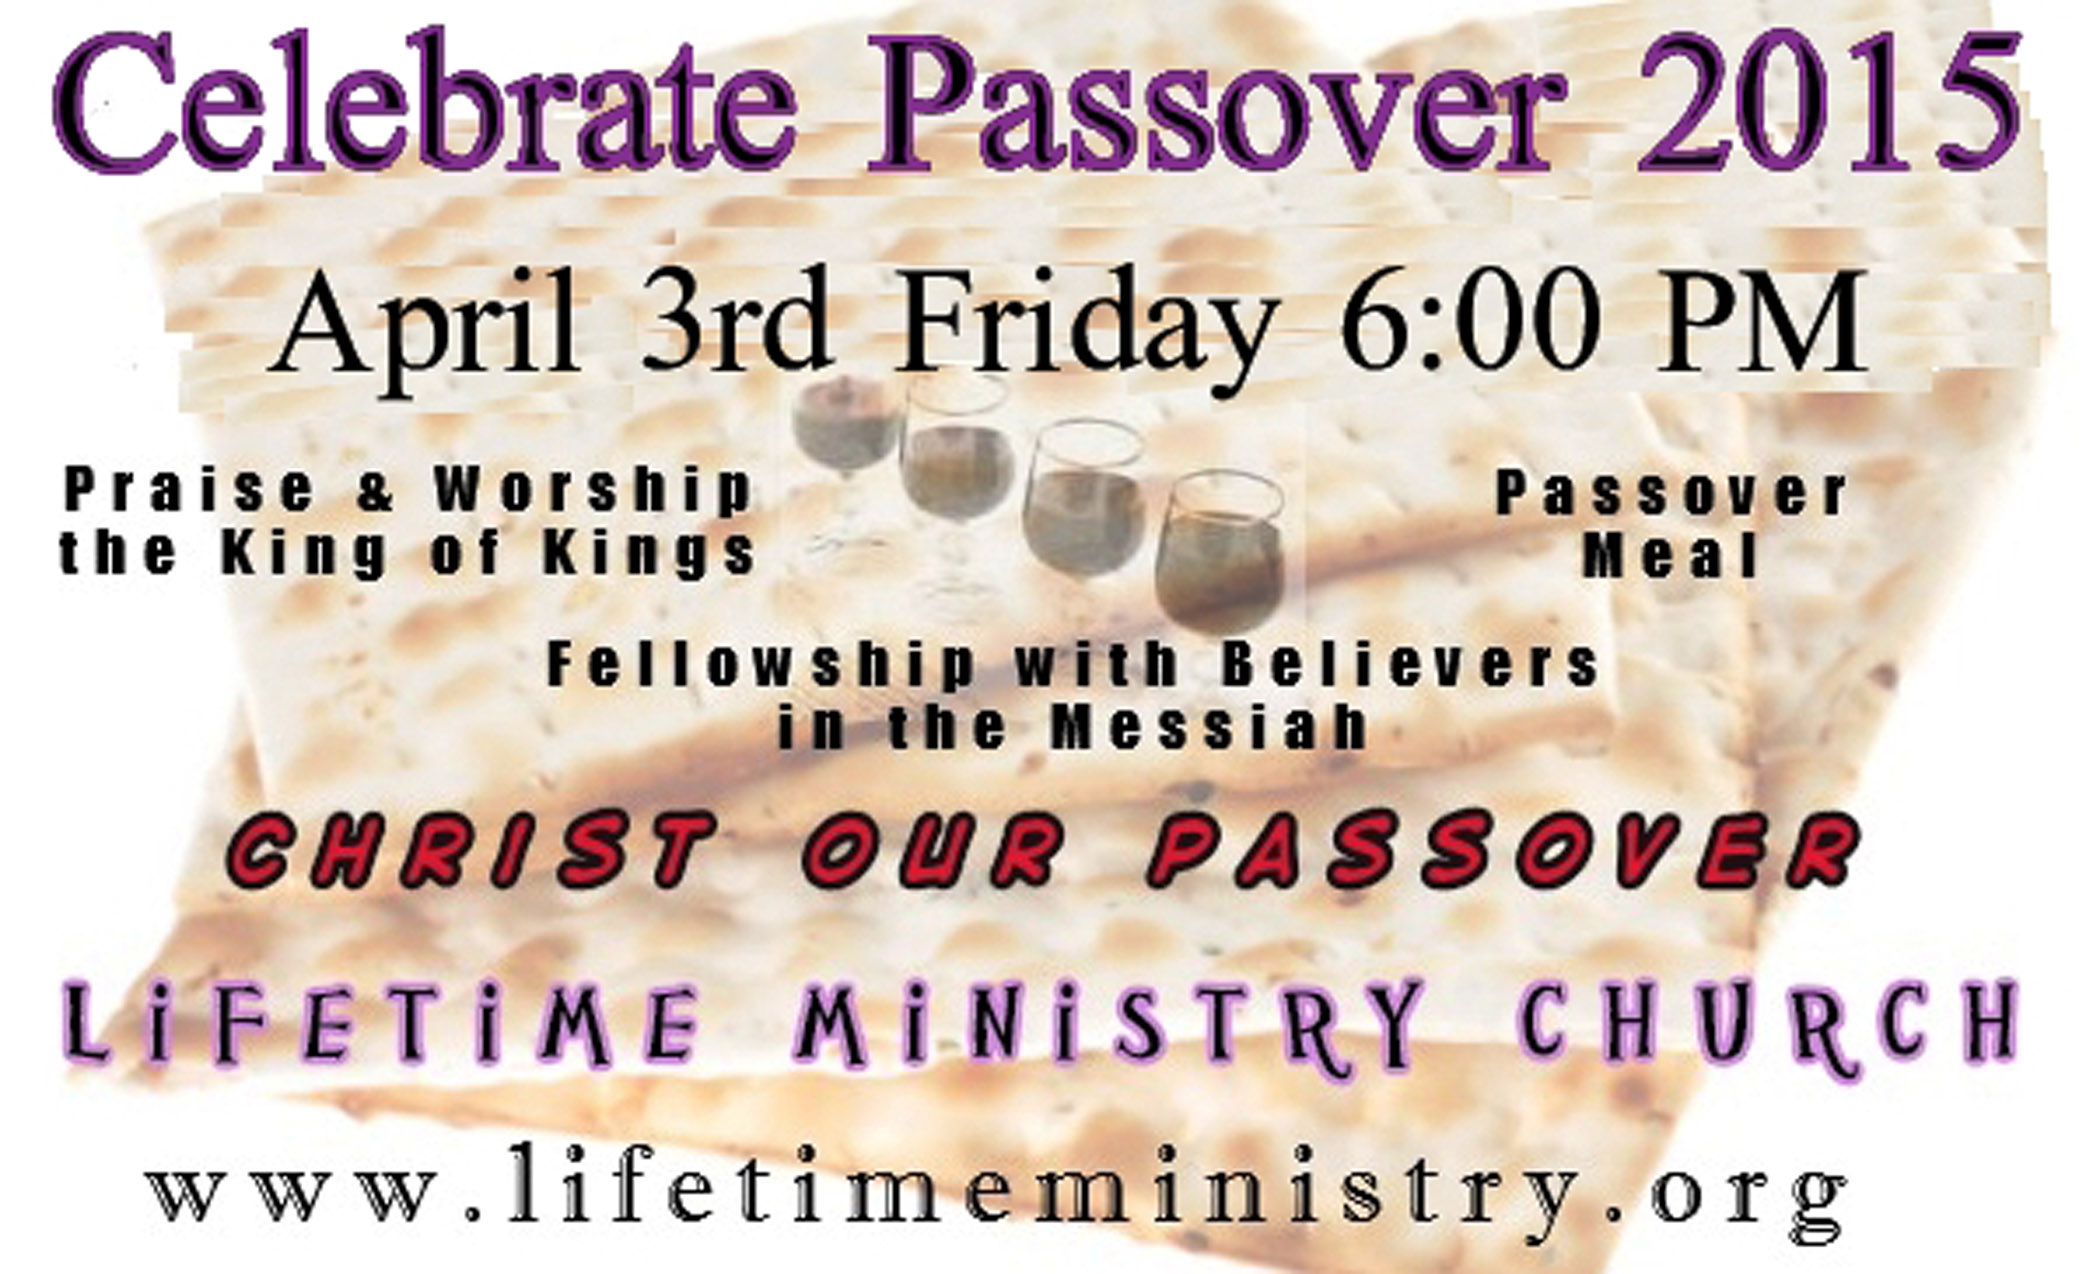 Passover Celebration 2015 Celebrate Passover 2015 April